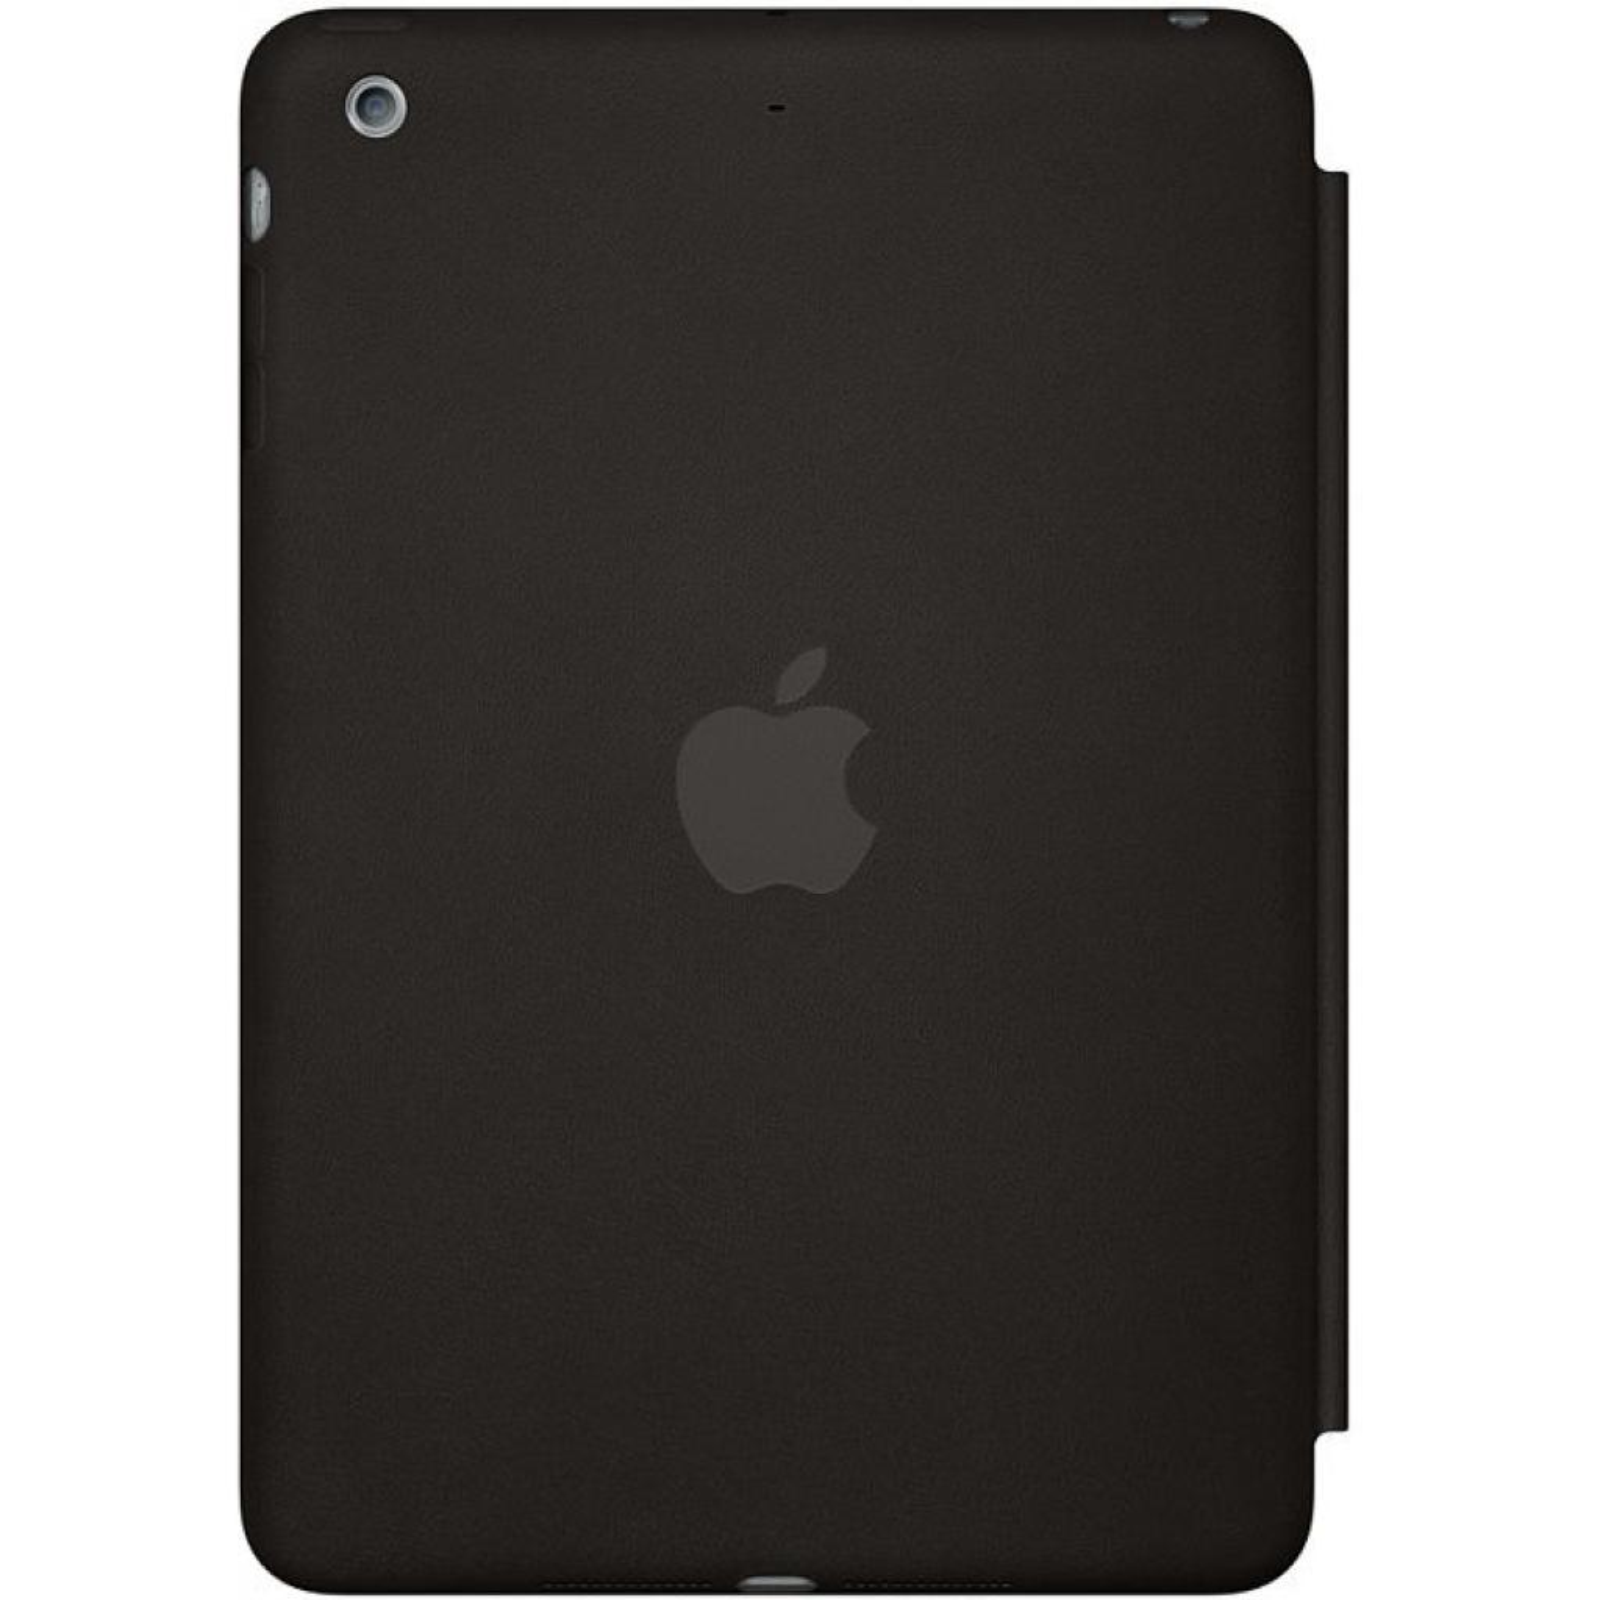 Чехол для планшета Apple Smart Case для iPad mini /black (ME710ZM/A) изображение 2